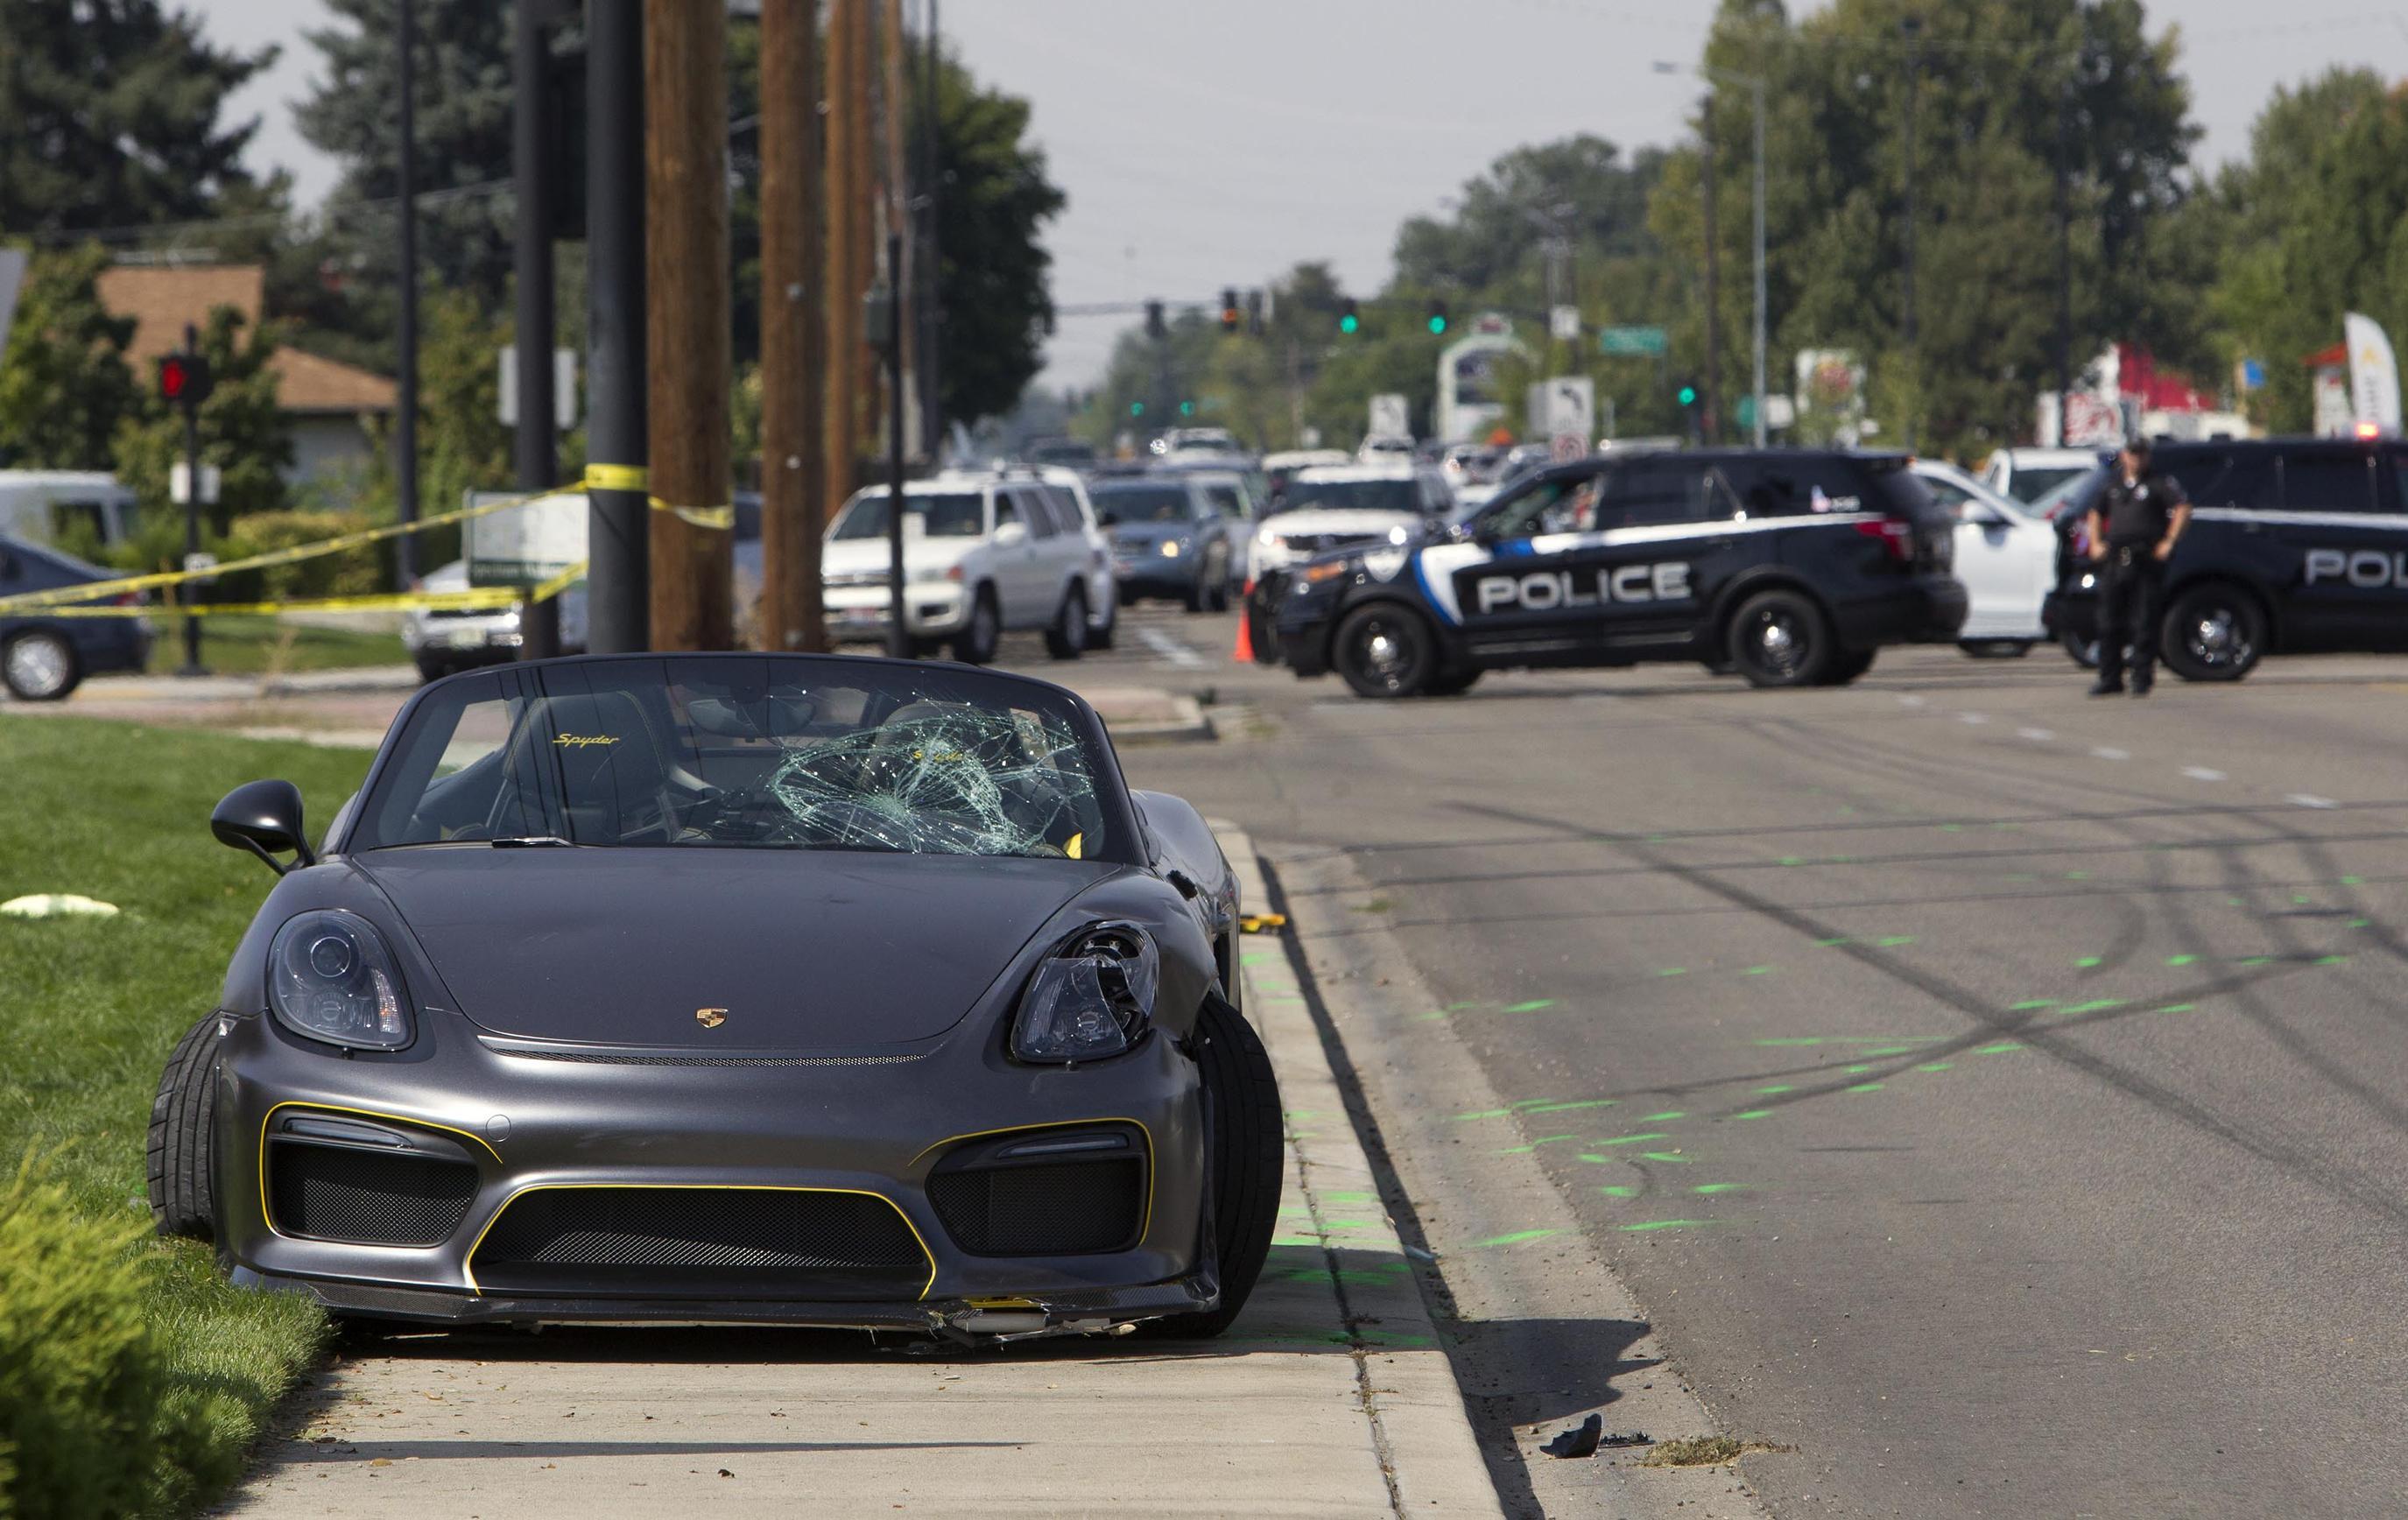 Porsche plows into spectators at Idaho car show